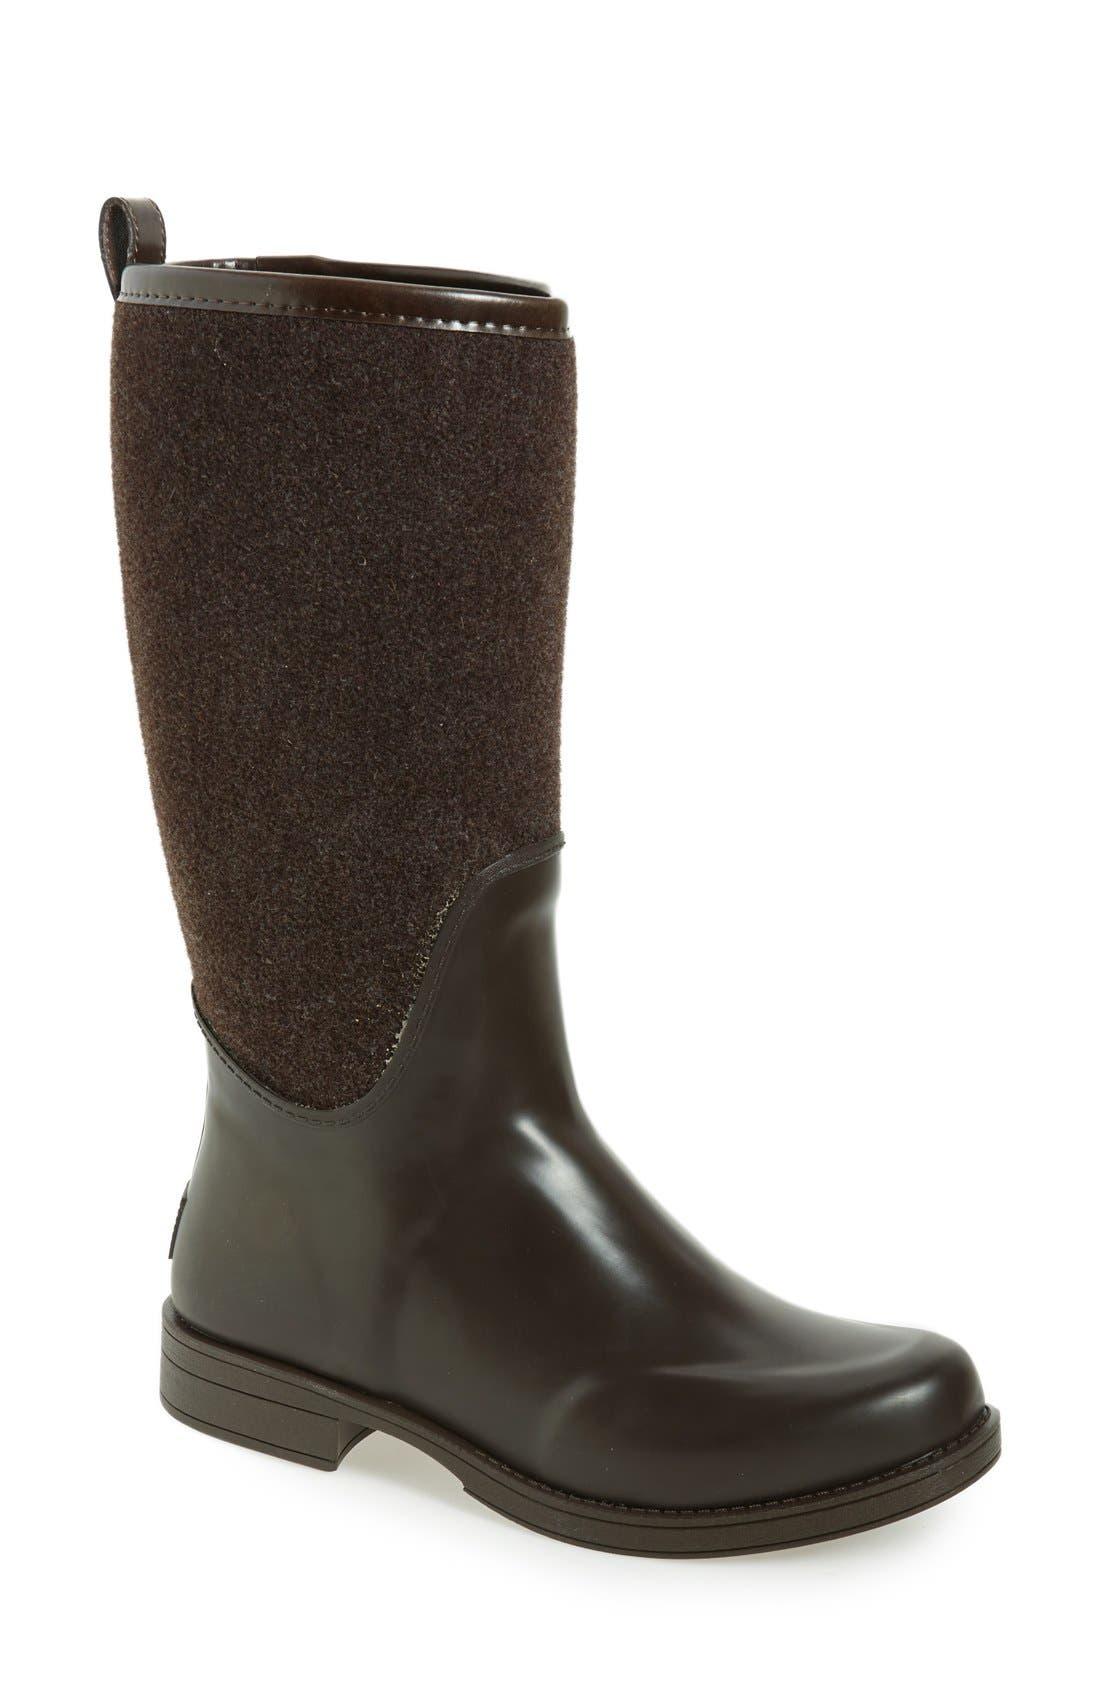 Alternate Image 1 Selected - UGG® Reignfall Waterproof Rain Boot (Women)